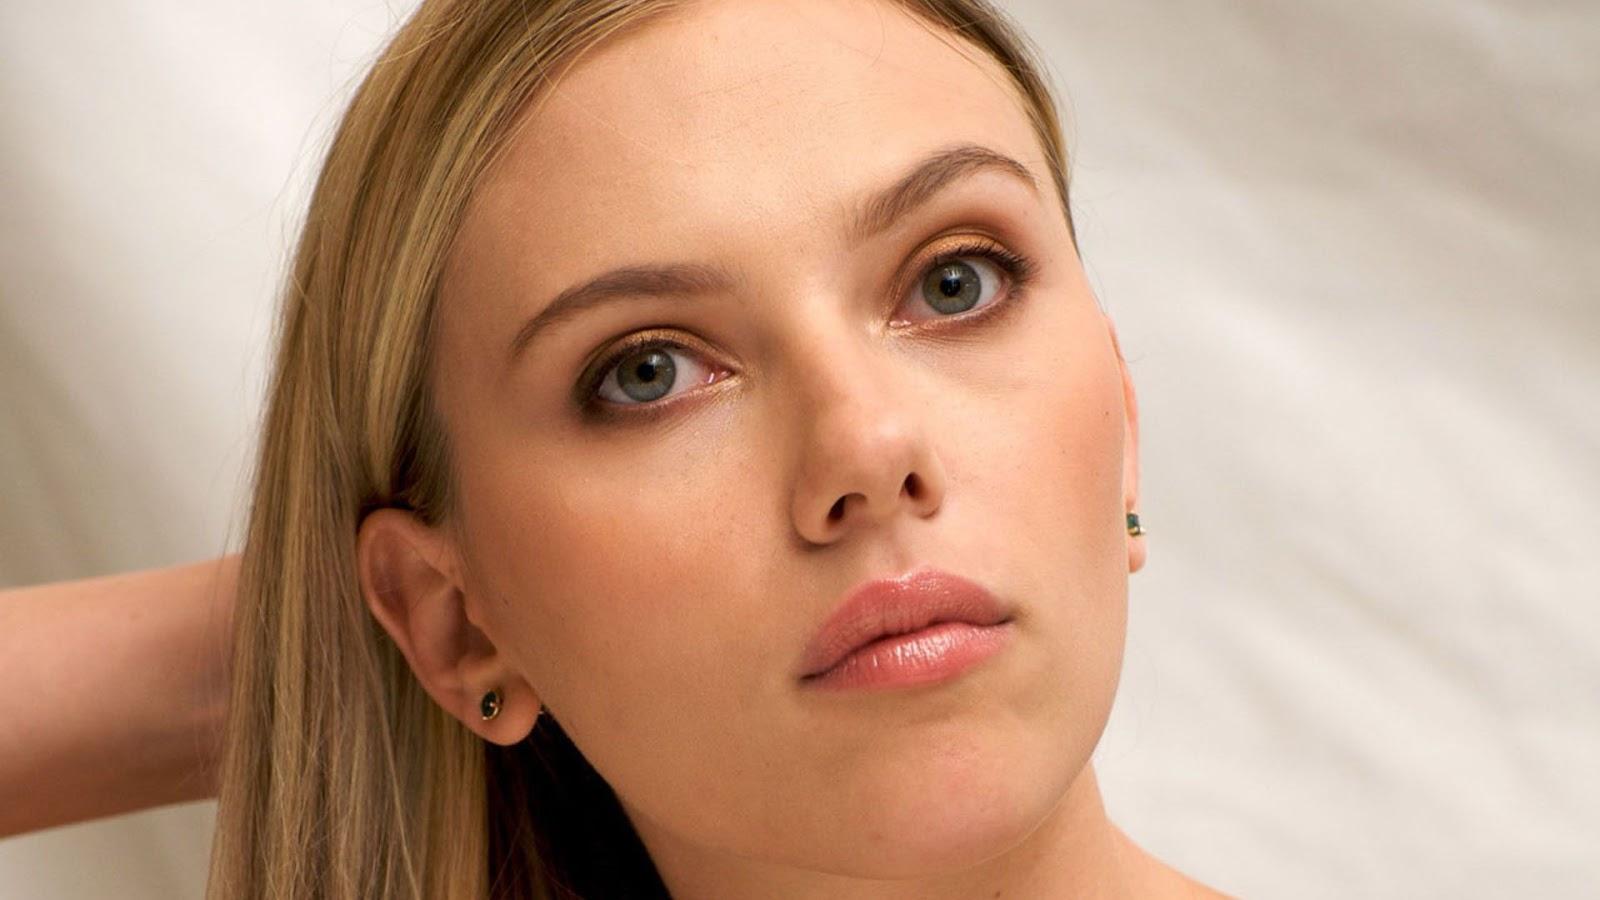 http://2.bp.blogspot.com/-X8W_XXILahM/USoz1B636lI/AAAAAAAAAJA/Tx3lSkz9sQo/s1600/Scarlett+Johansson+Hot+Wallpapers+Free+Download.jpg